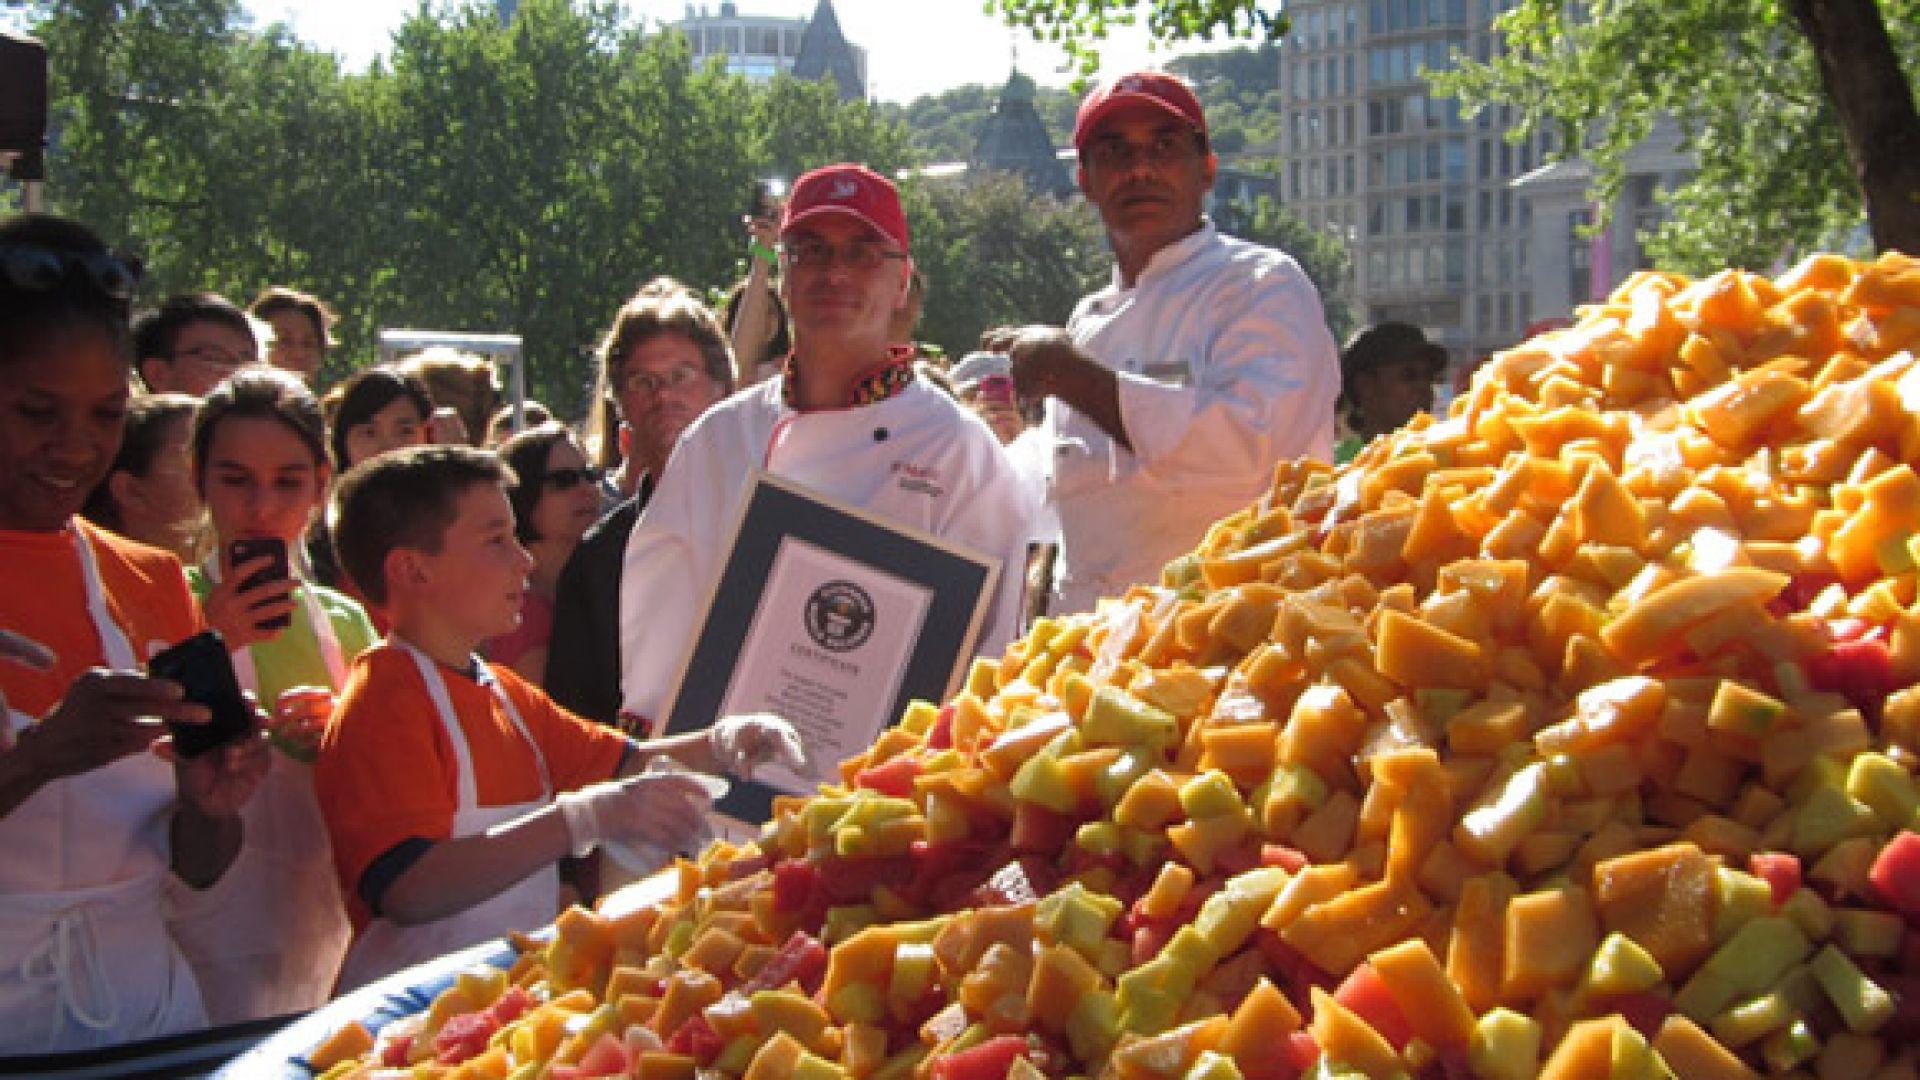 Френски град постави рекорд на Гинес за най-голяма плодова салата